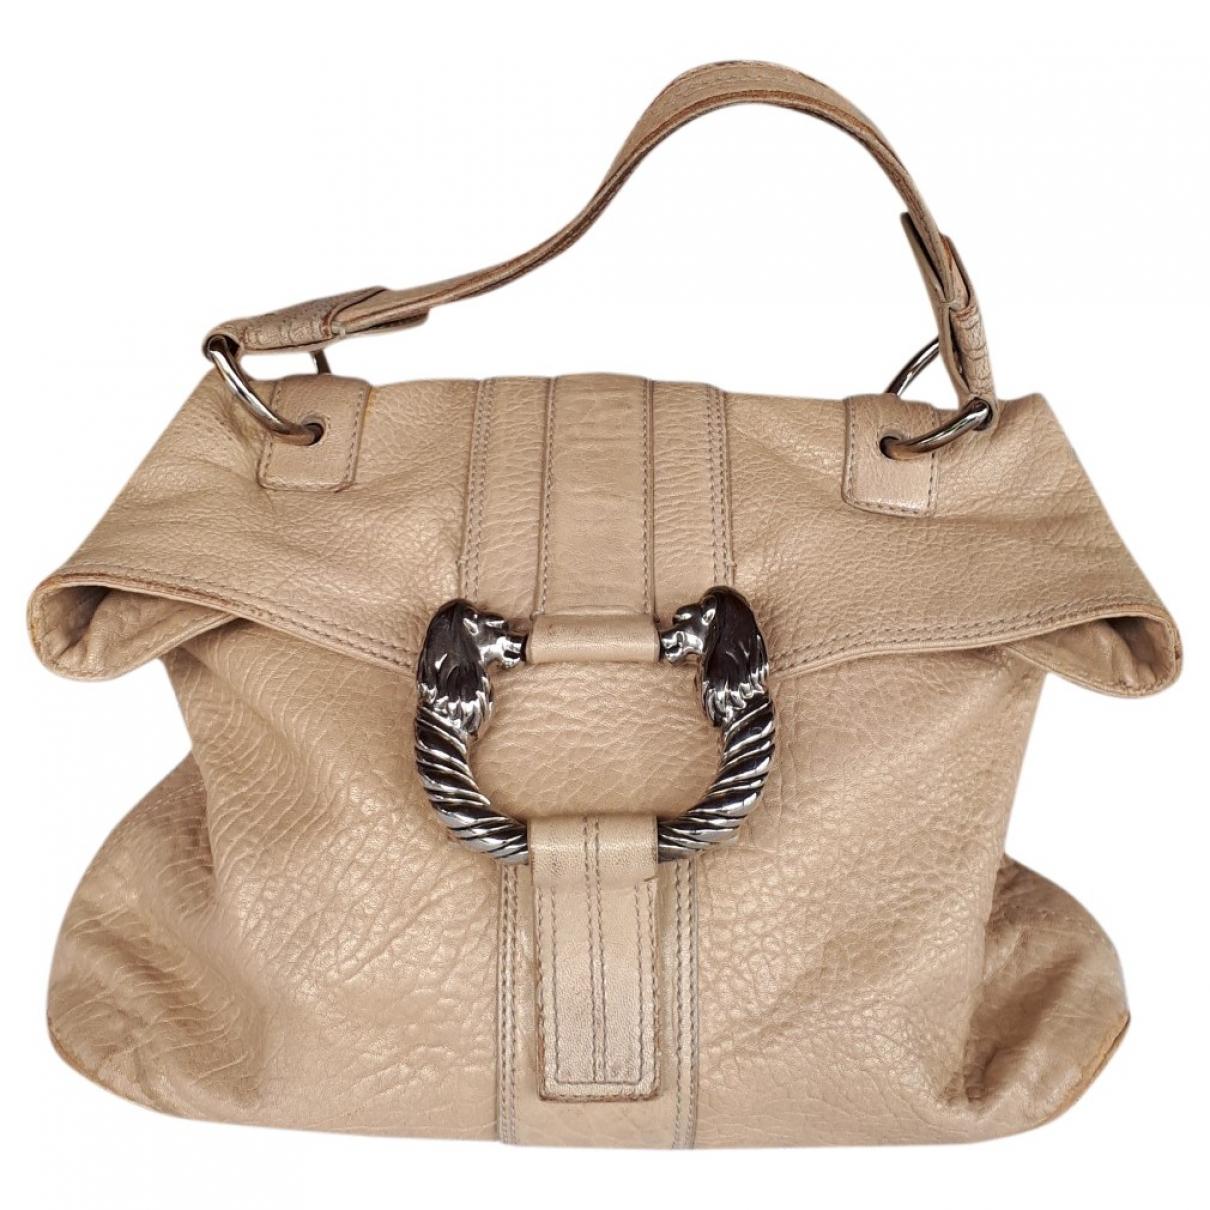 Bvlgari \N Handtasche in  Beige Leder